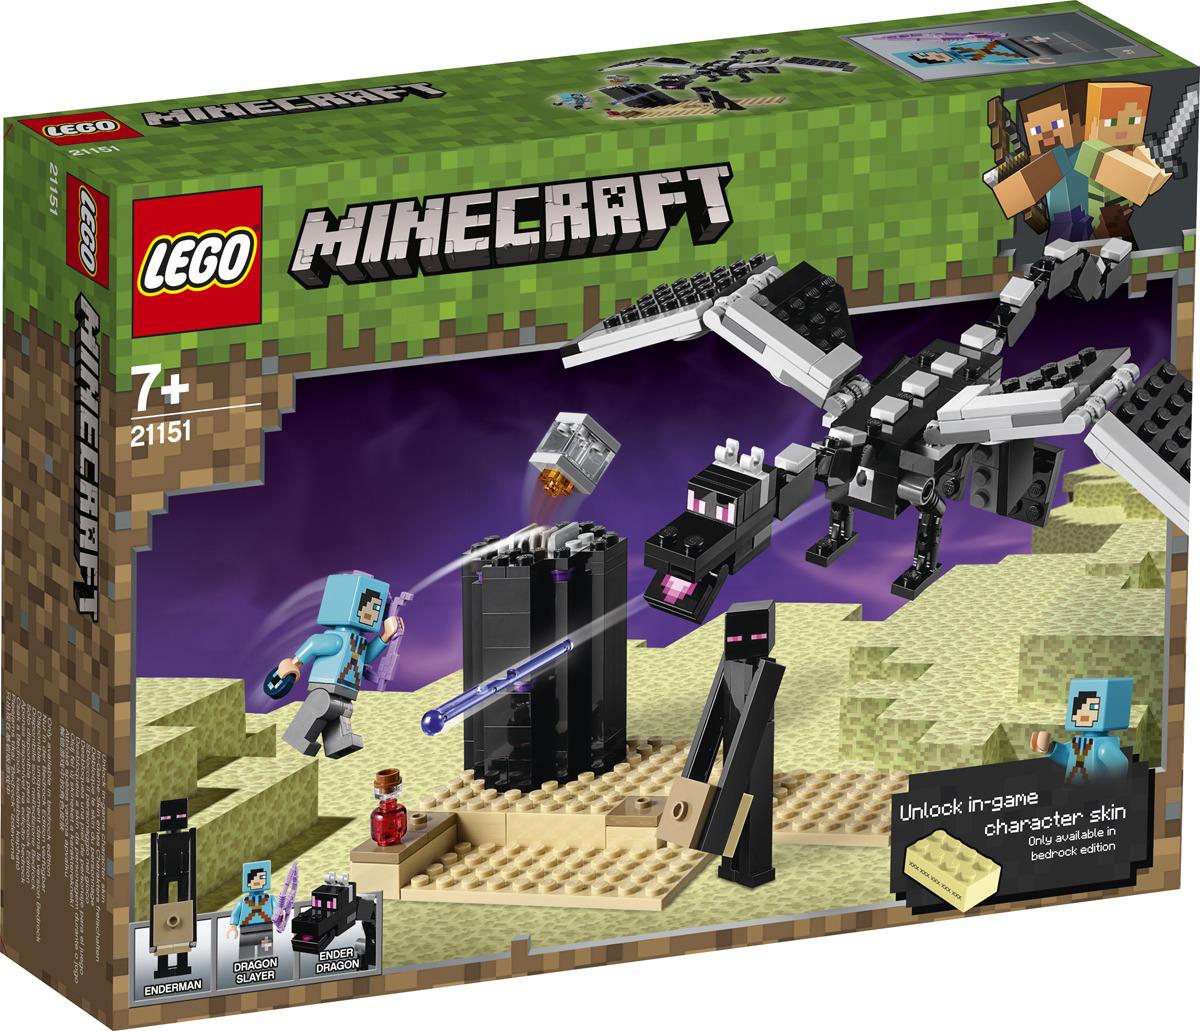 LEGO Minecraft 21151 Последняя битва Конструктор конструктор lego minecraft последняя битва 222 дет 21151